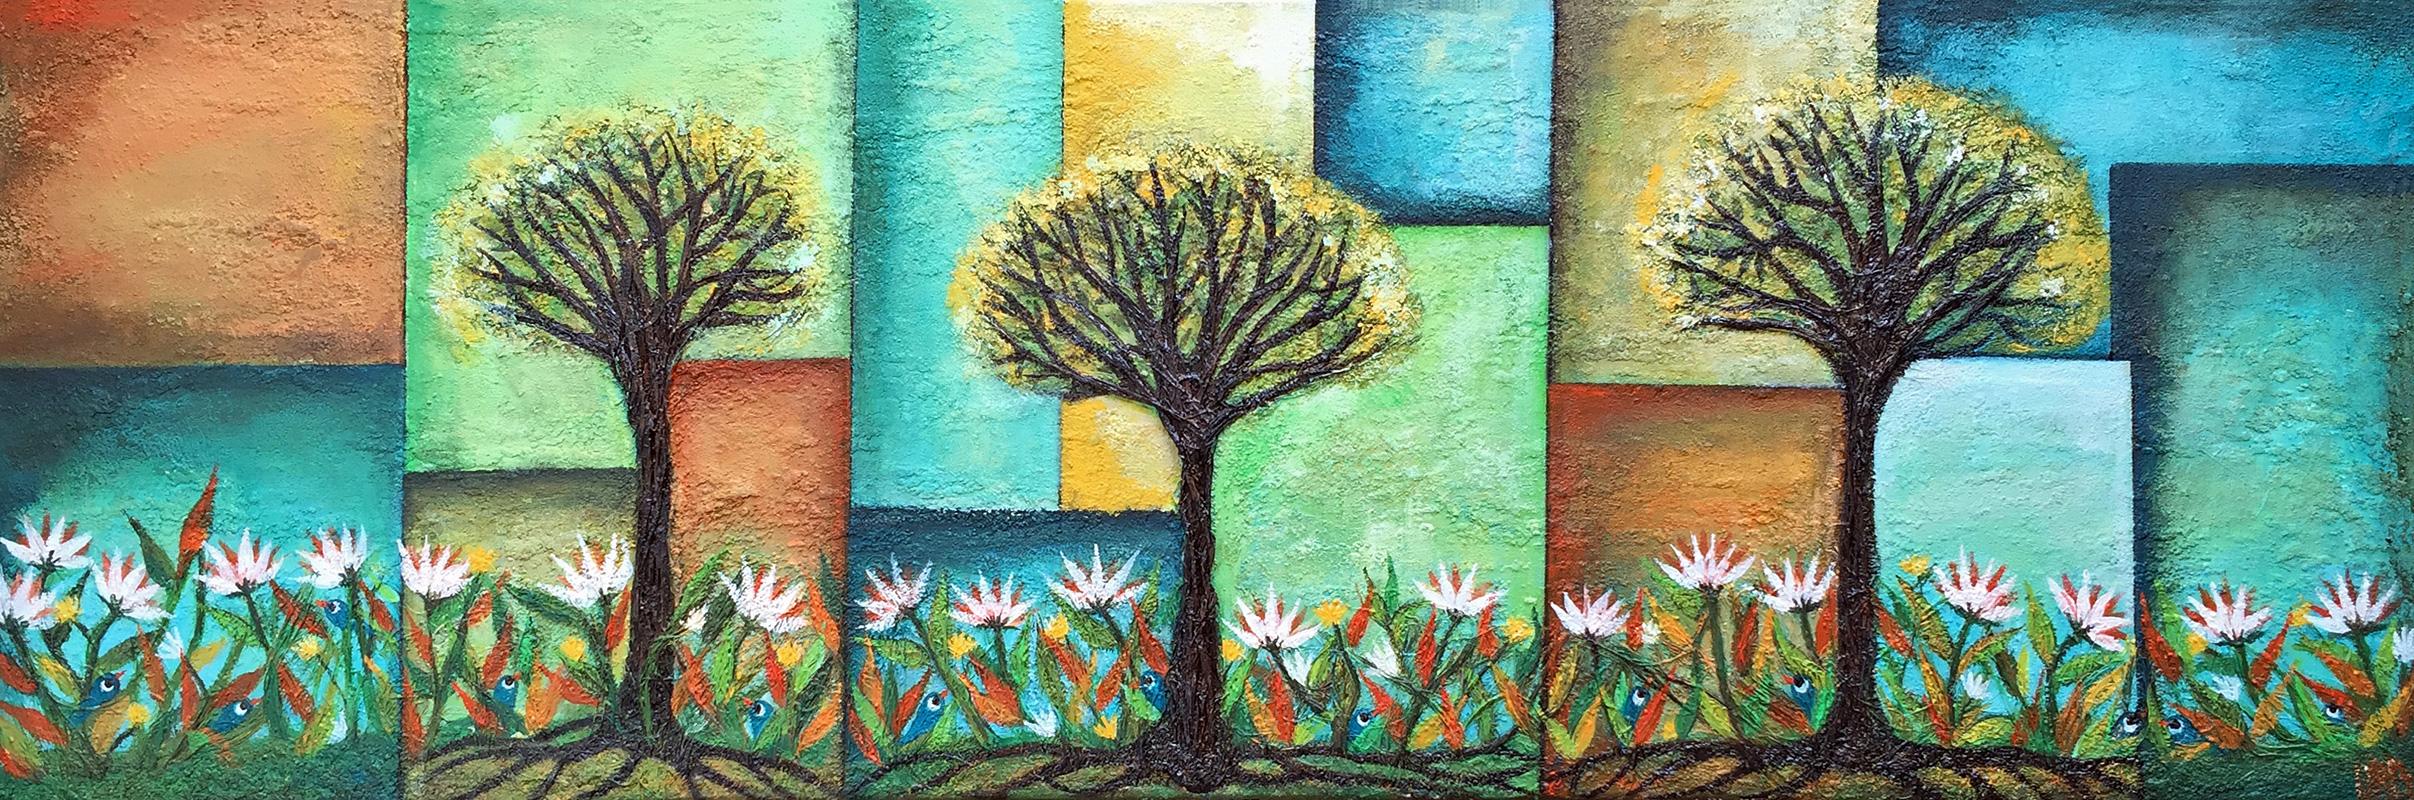 Un dia de primavera | Frühlingstag | 120x40 | Copyright URPI